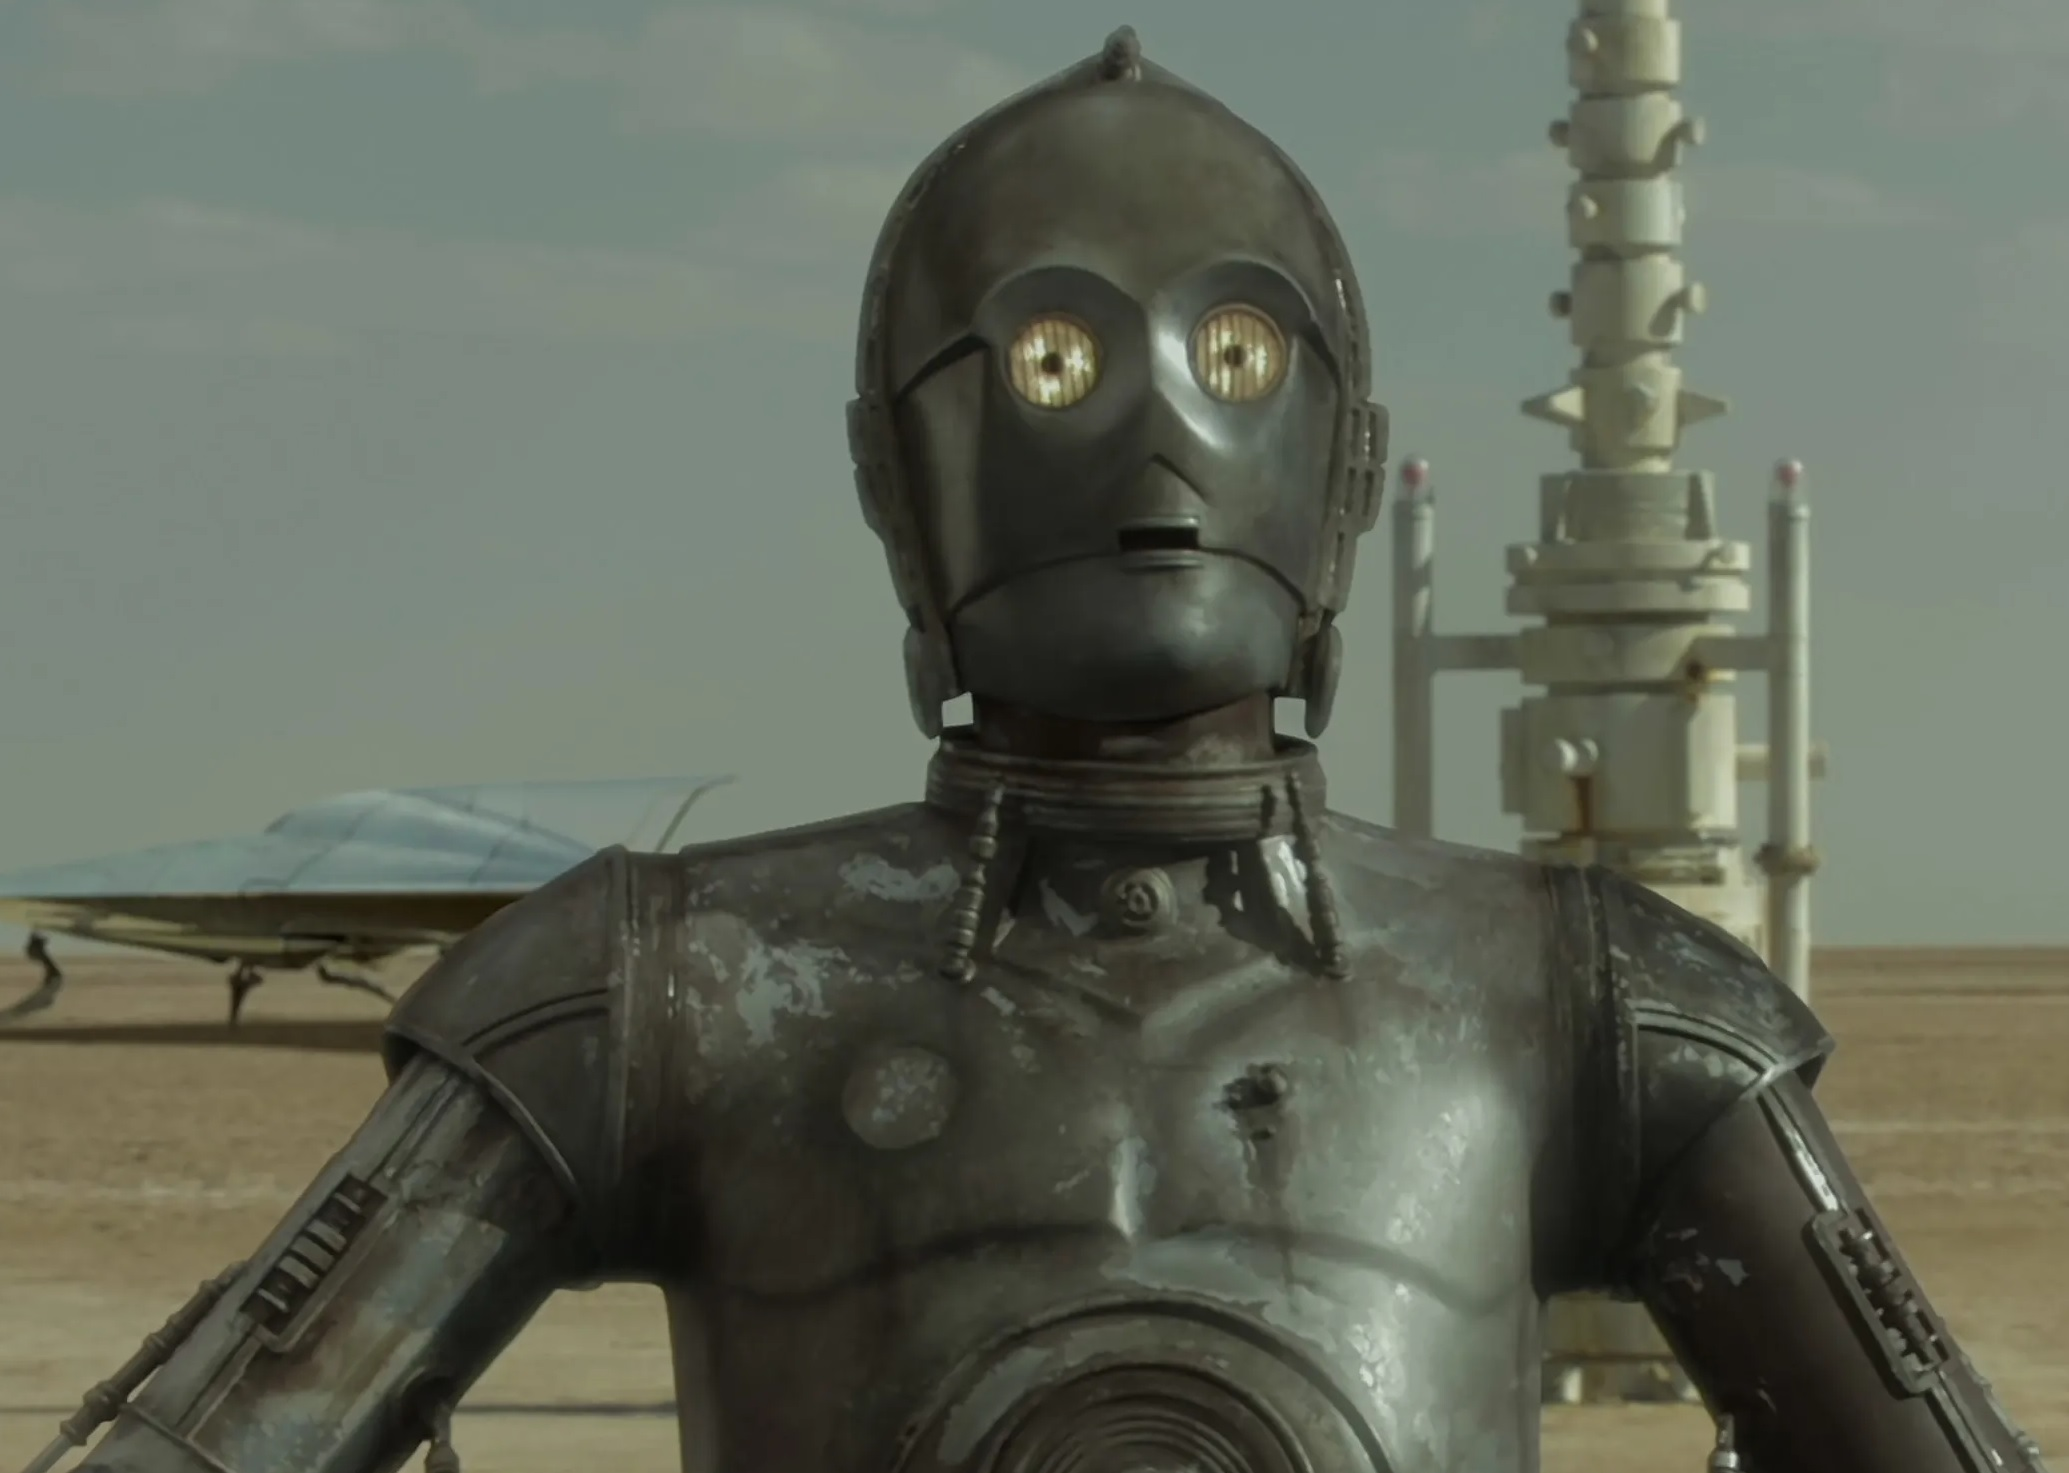 File:Anthony Daniels as C-3PO (AOTC).jpg